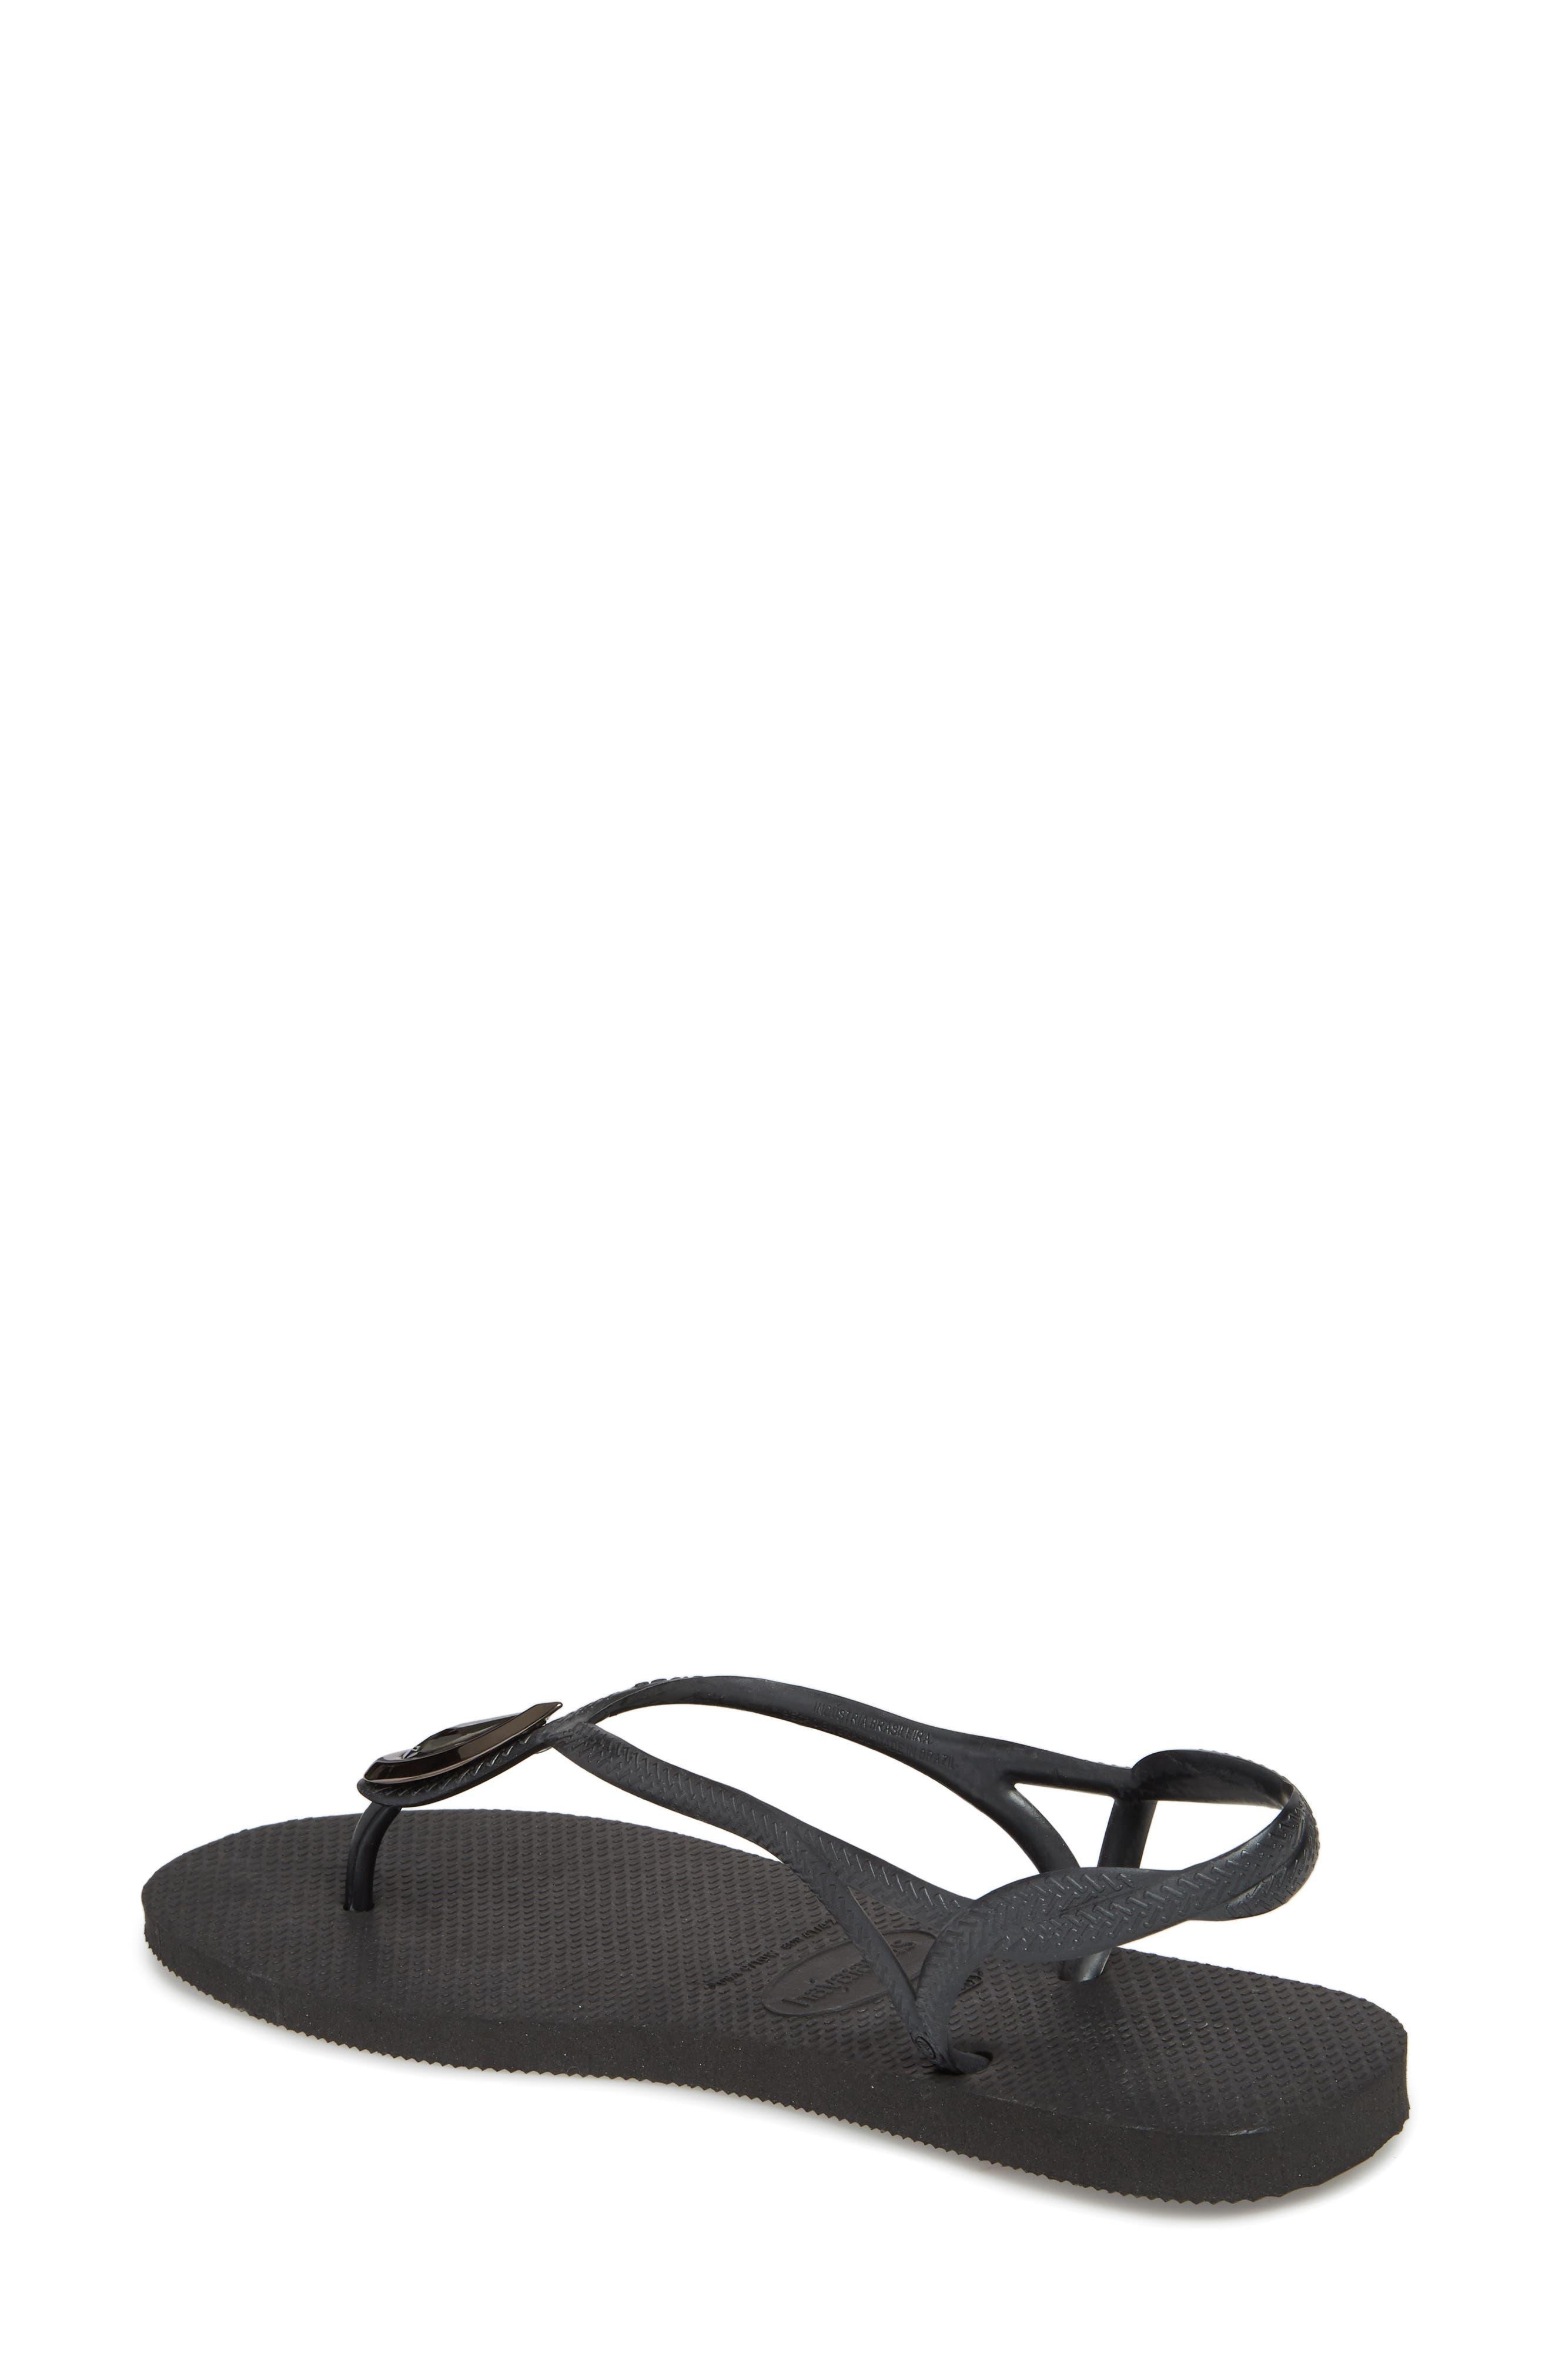 Luna Sandal,                             Alternate thumbnail 2, color,                             BLACK/ BLACK